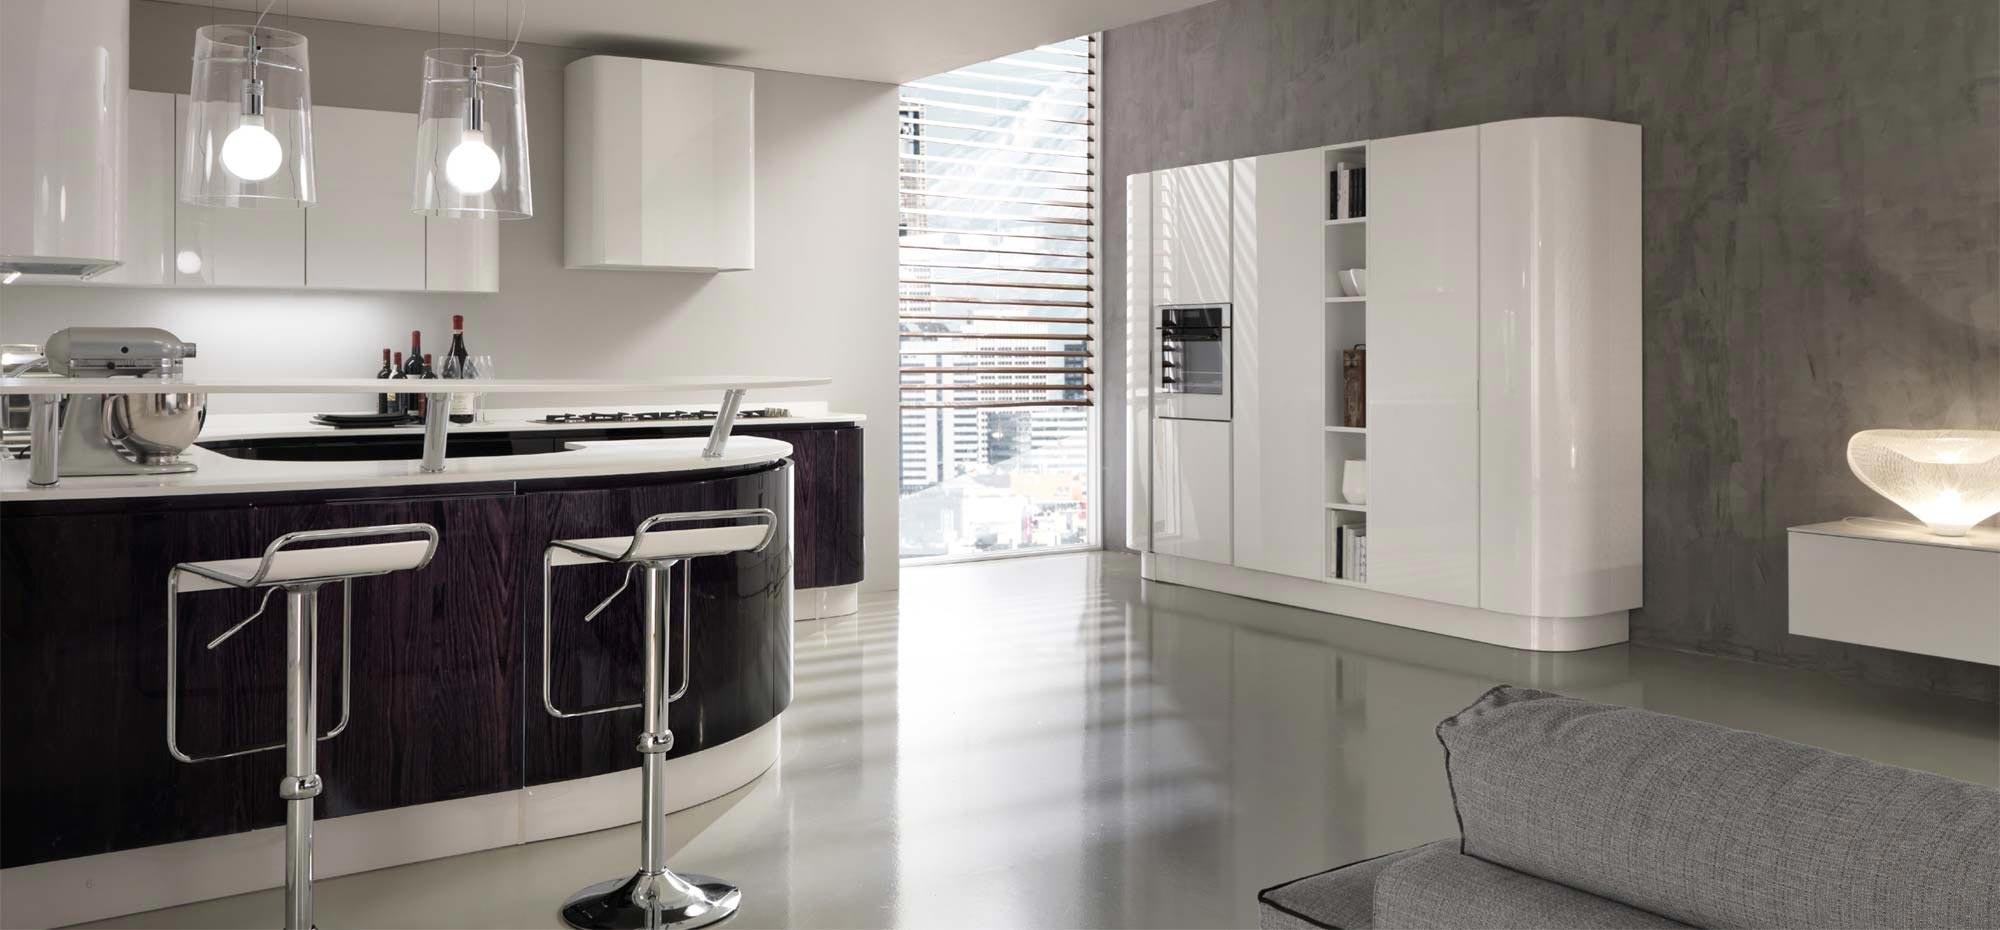 Emejing Cucine Berloni Moderne Prezzi Photos - Ideas & Design 2017 ...